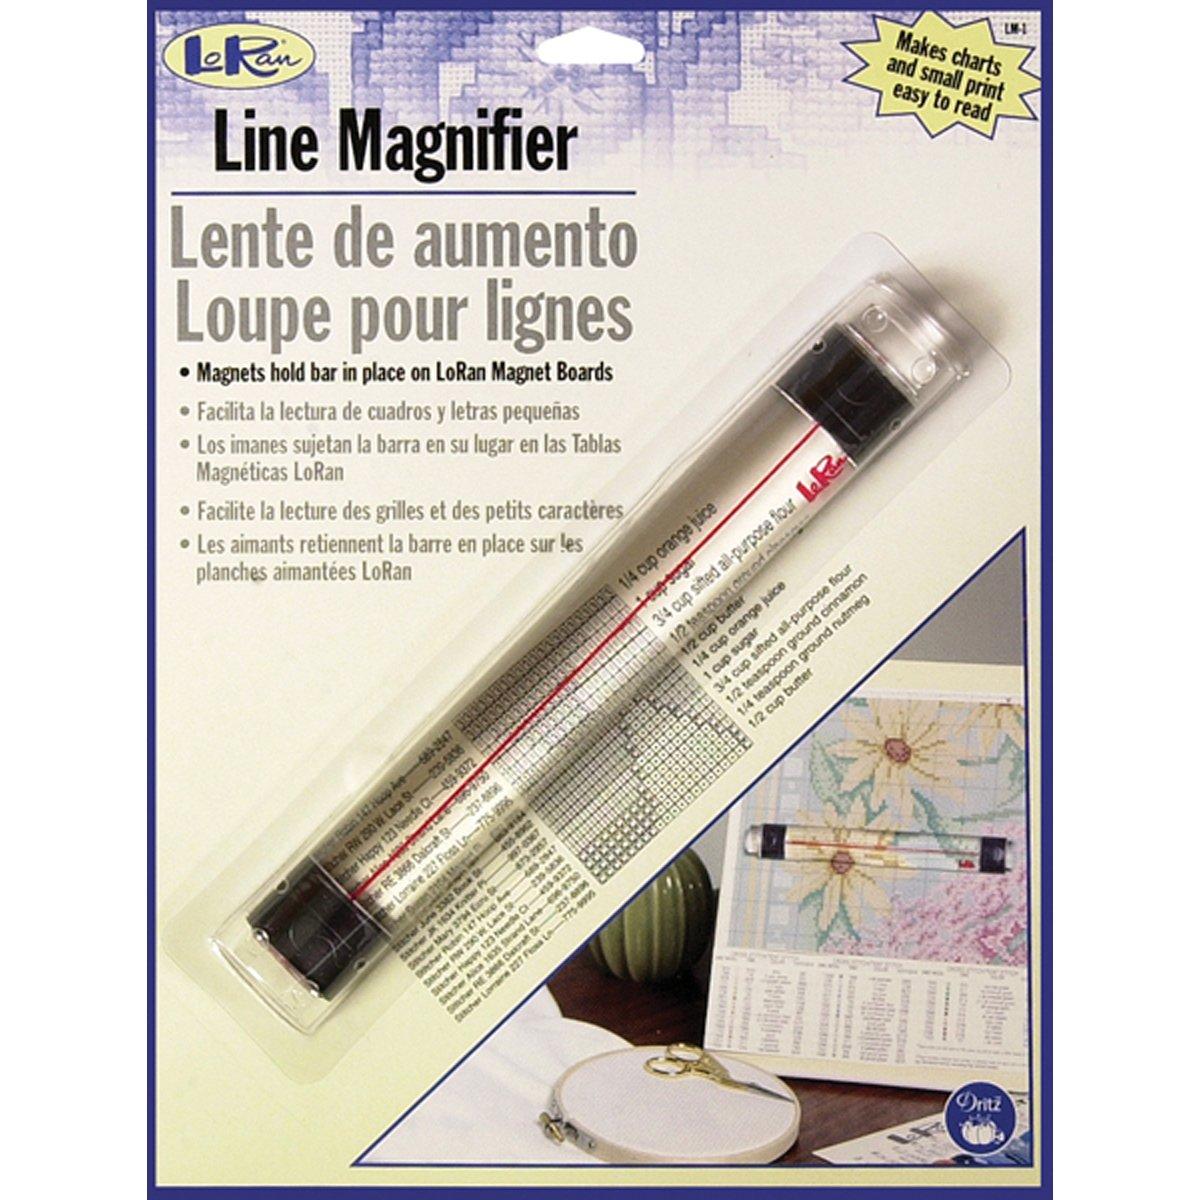 Dritz LoRan Magnetic Line Magnifier .875-Inchx6.5-Inch LM-1